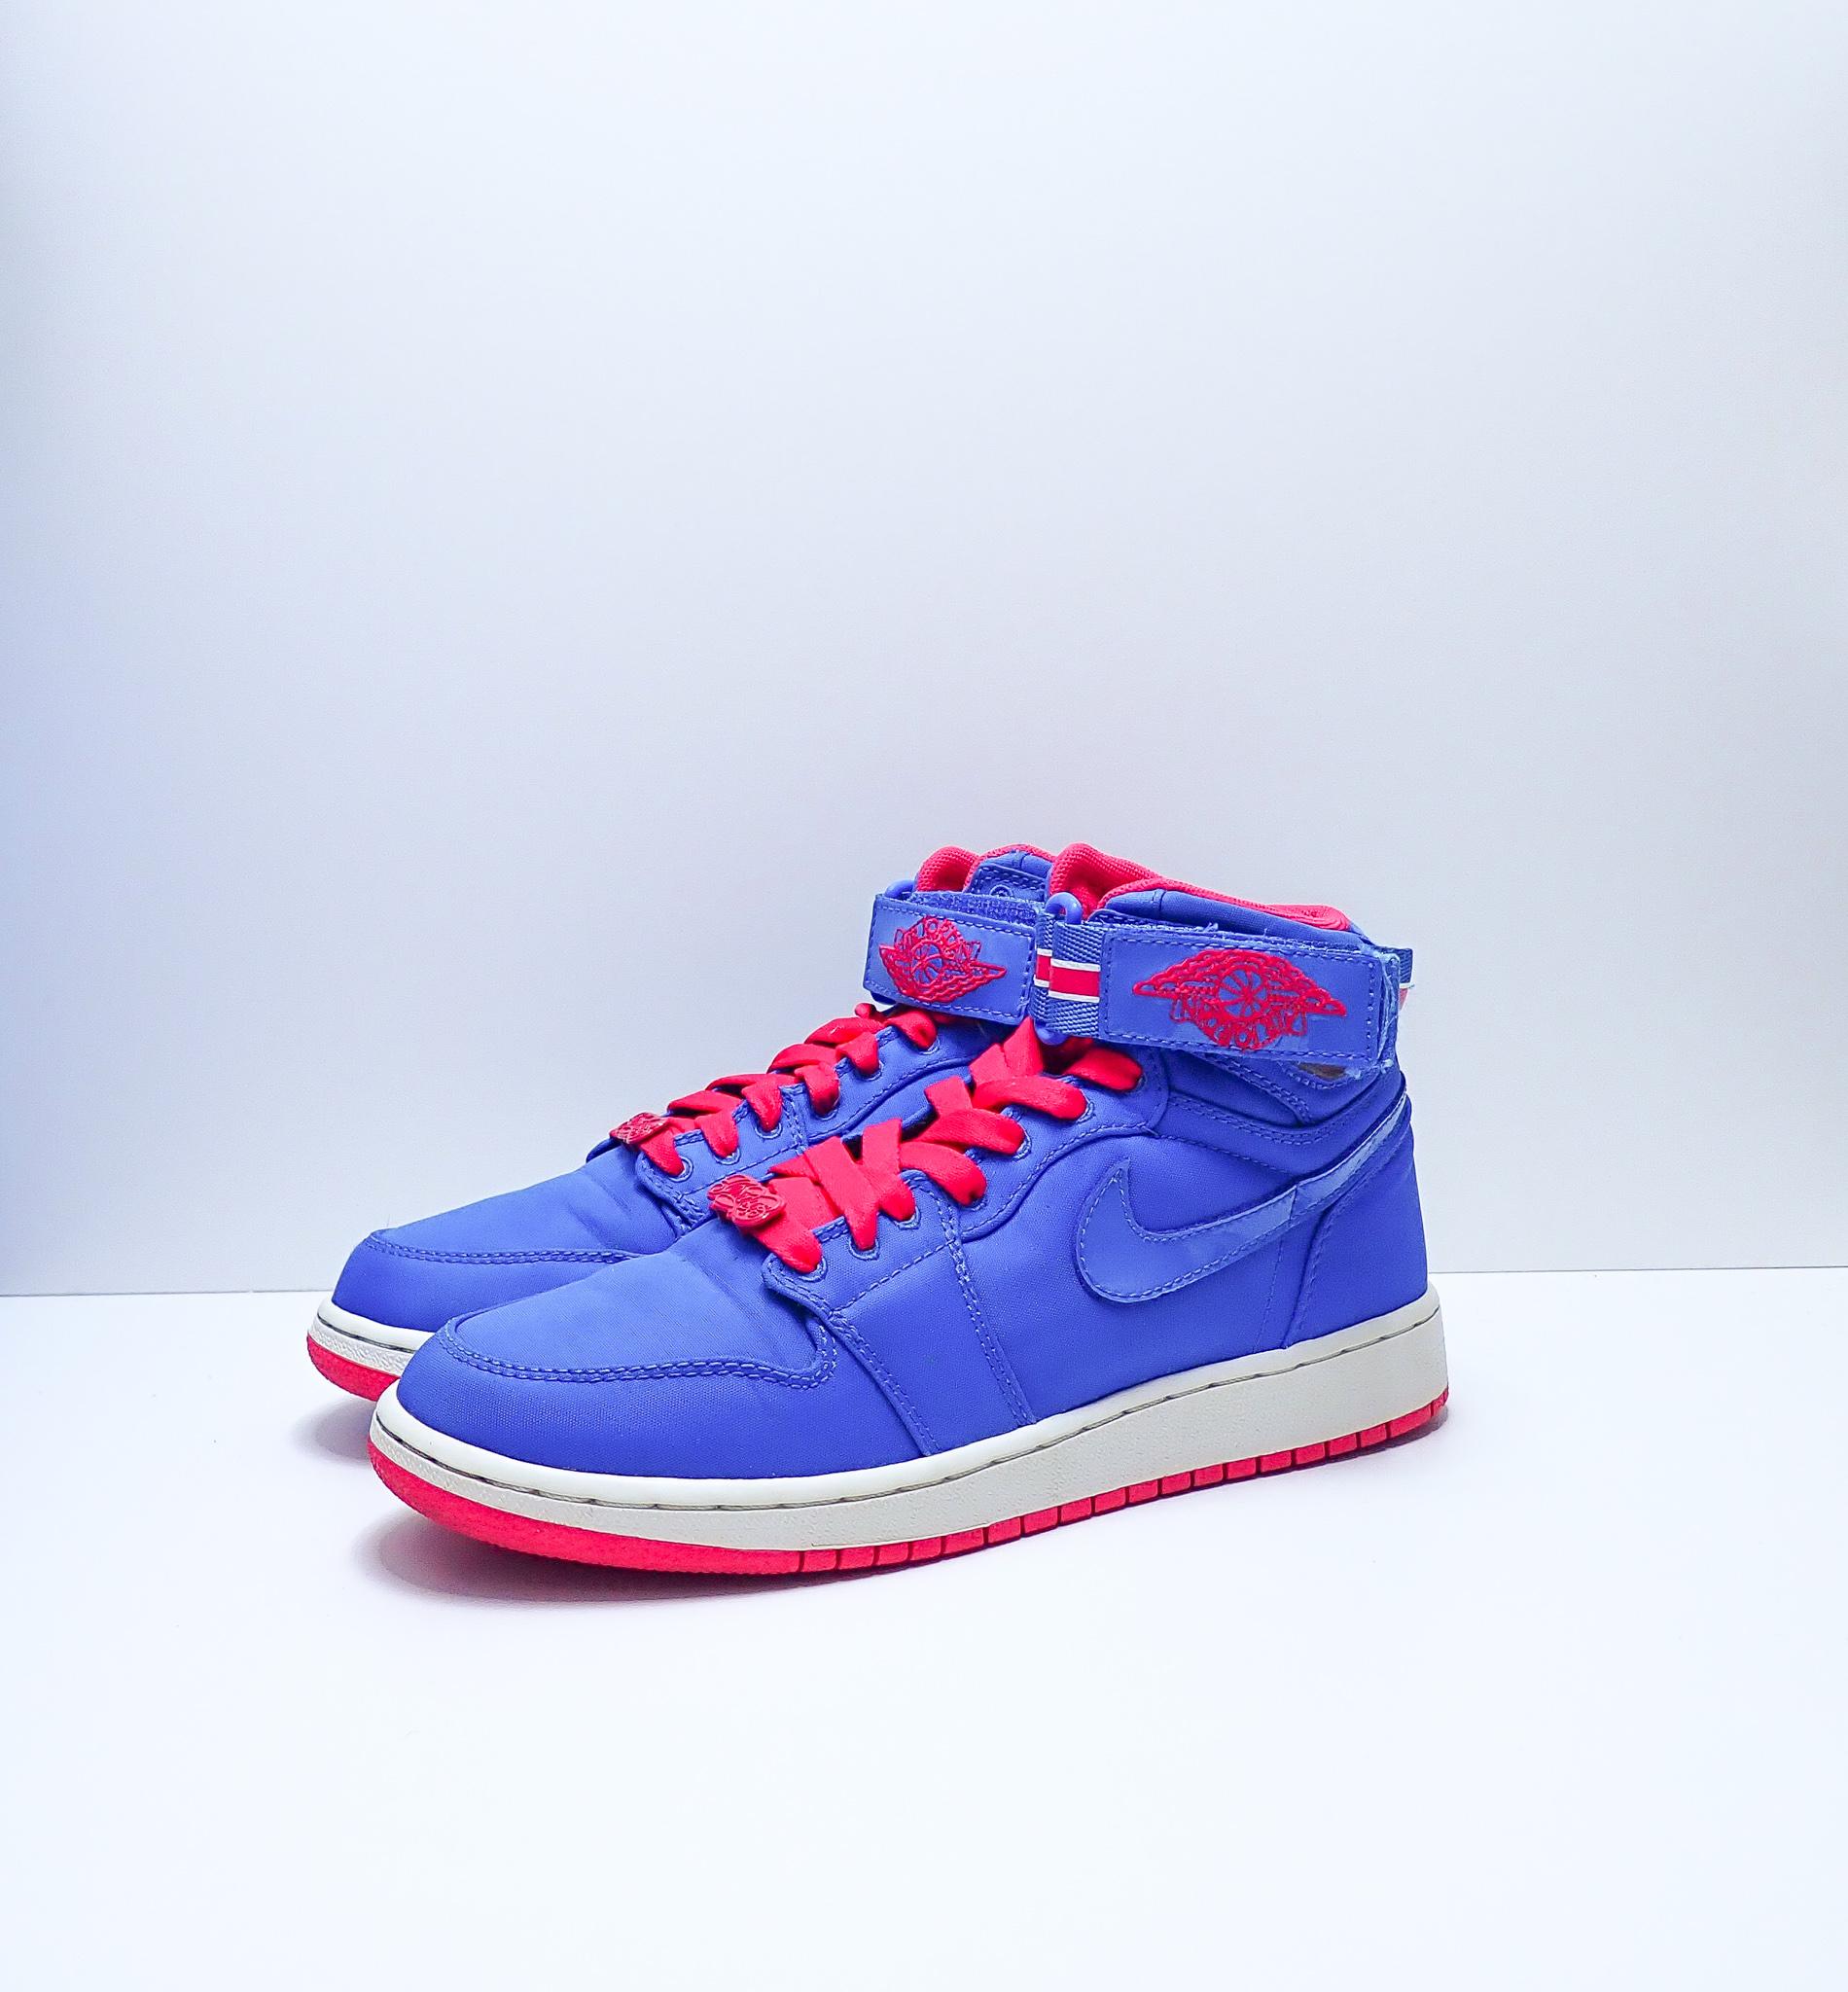 Jordan 1 Hi Strap GS Blue